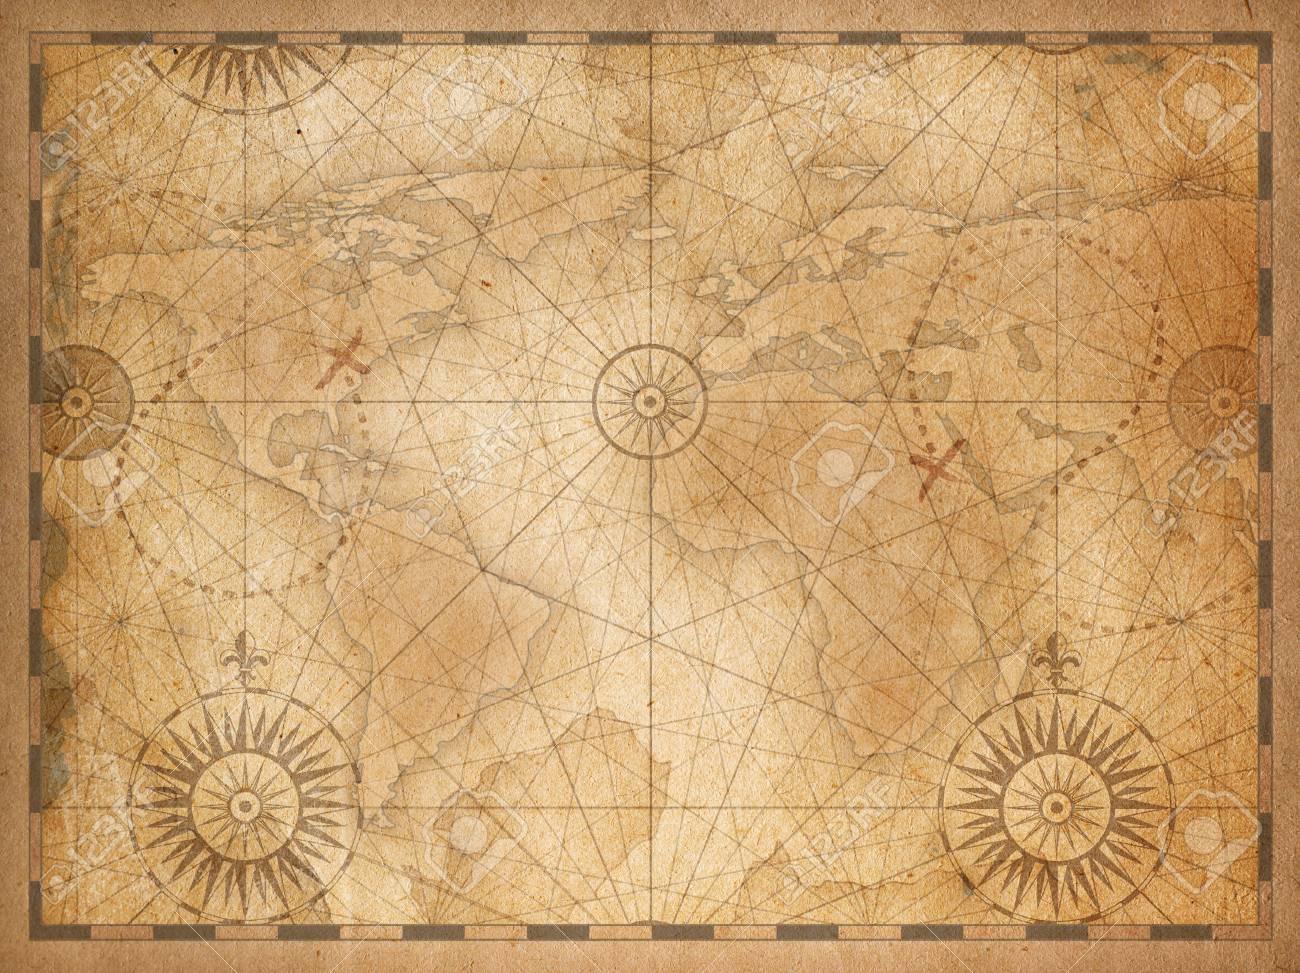 Vintage medieval nautical world map background - 112401227